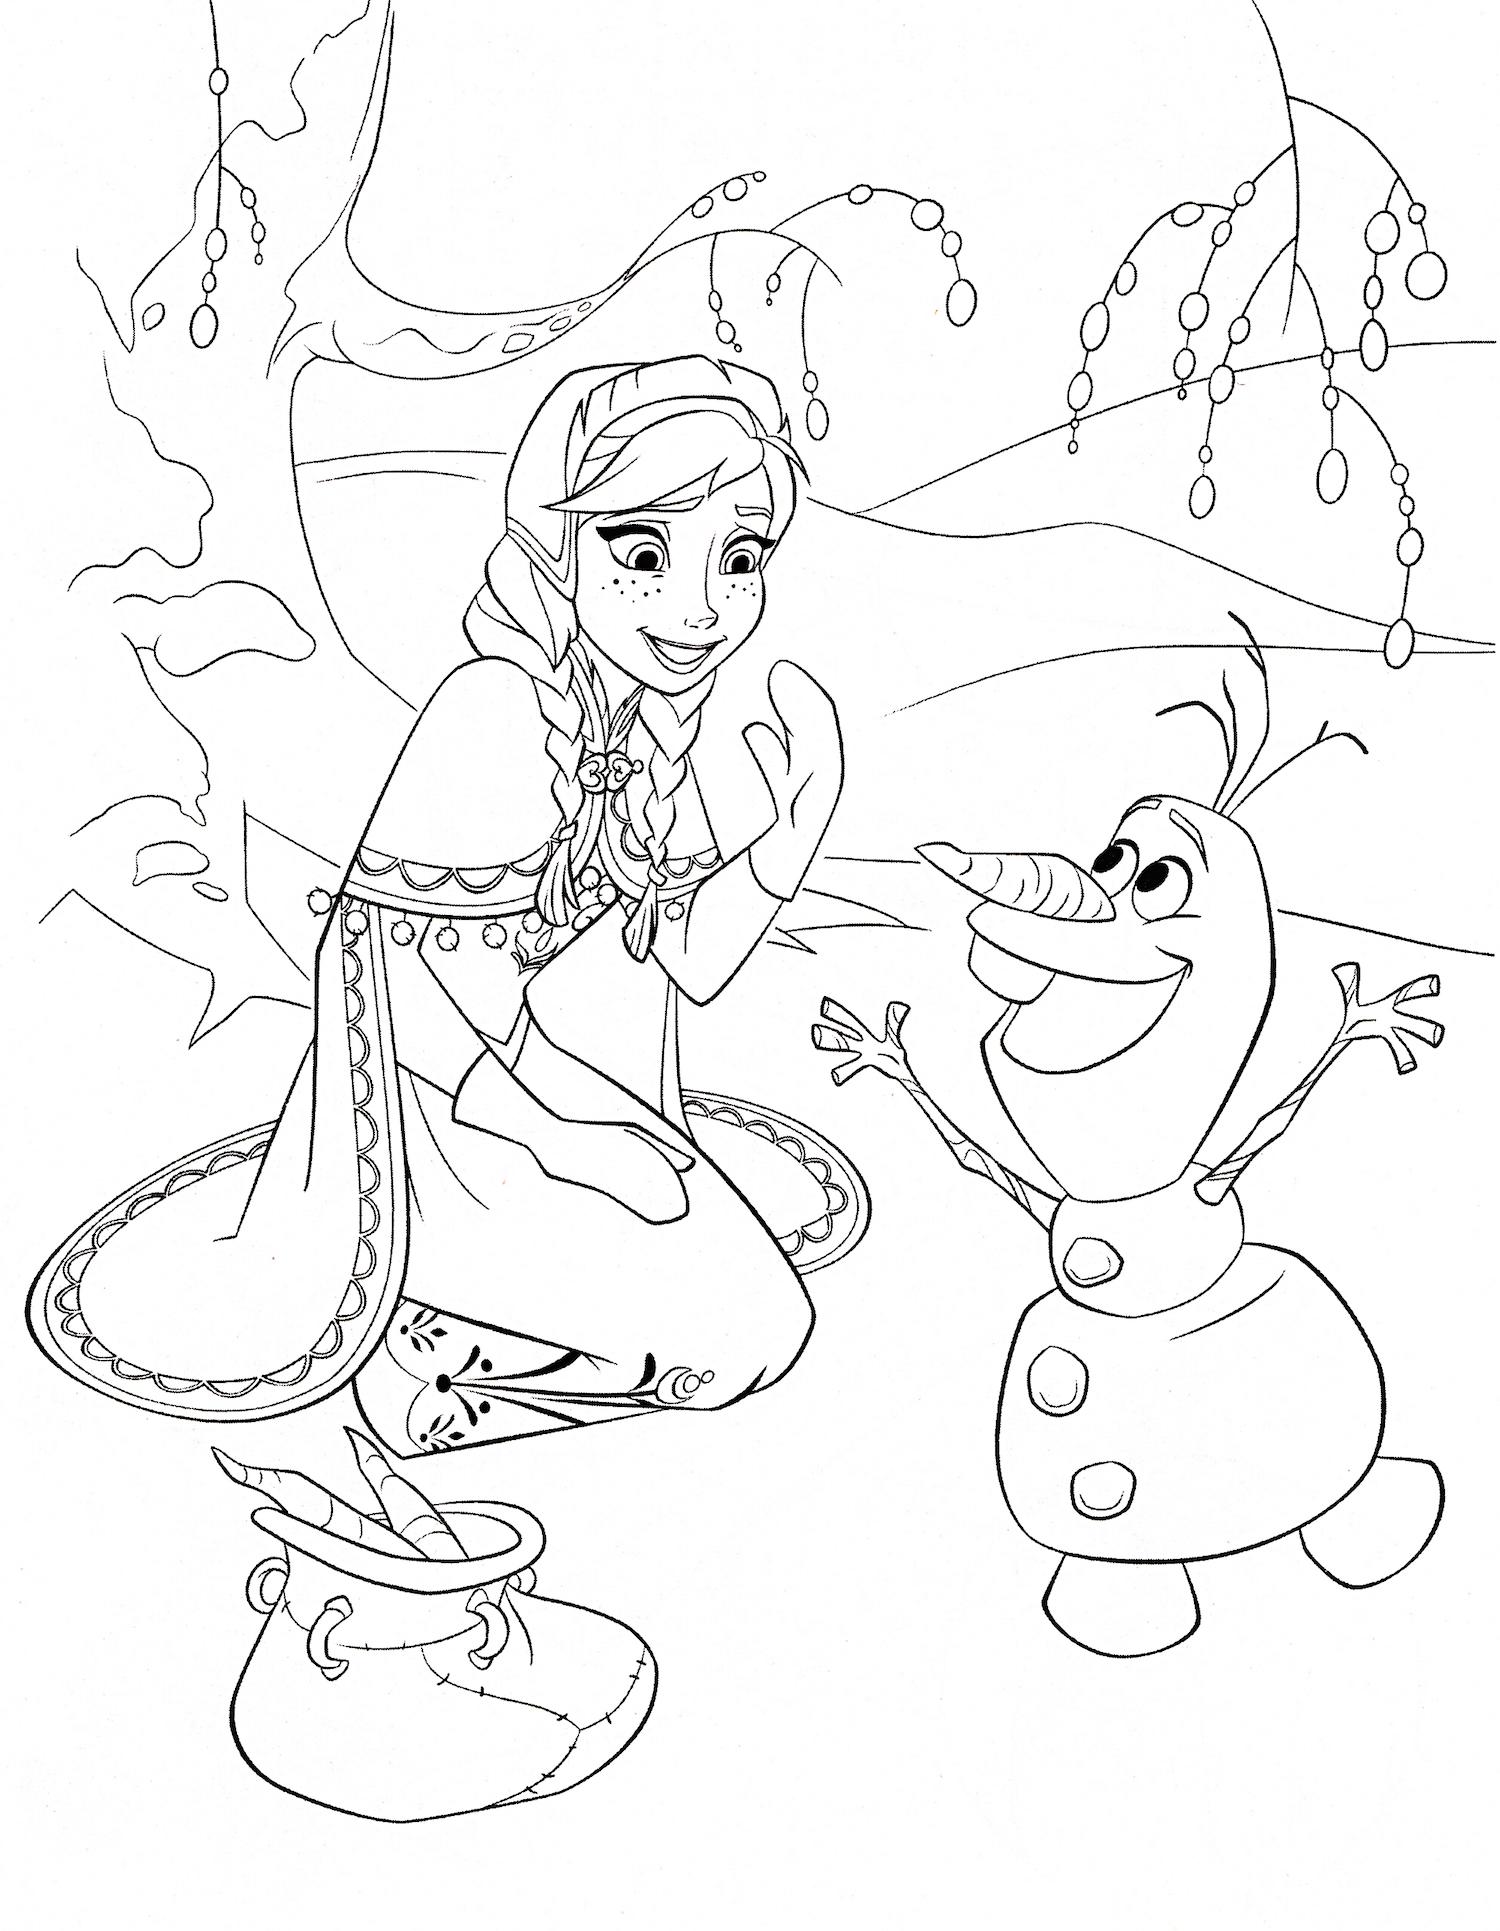 desenhos-para-colorir-frozen-ana-olaf